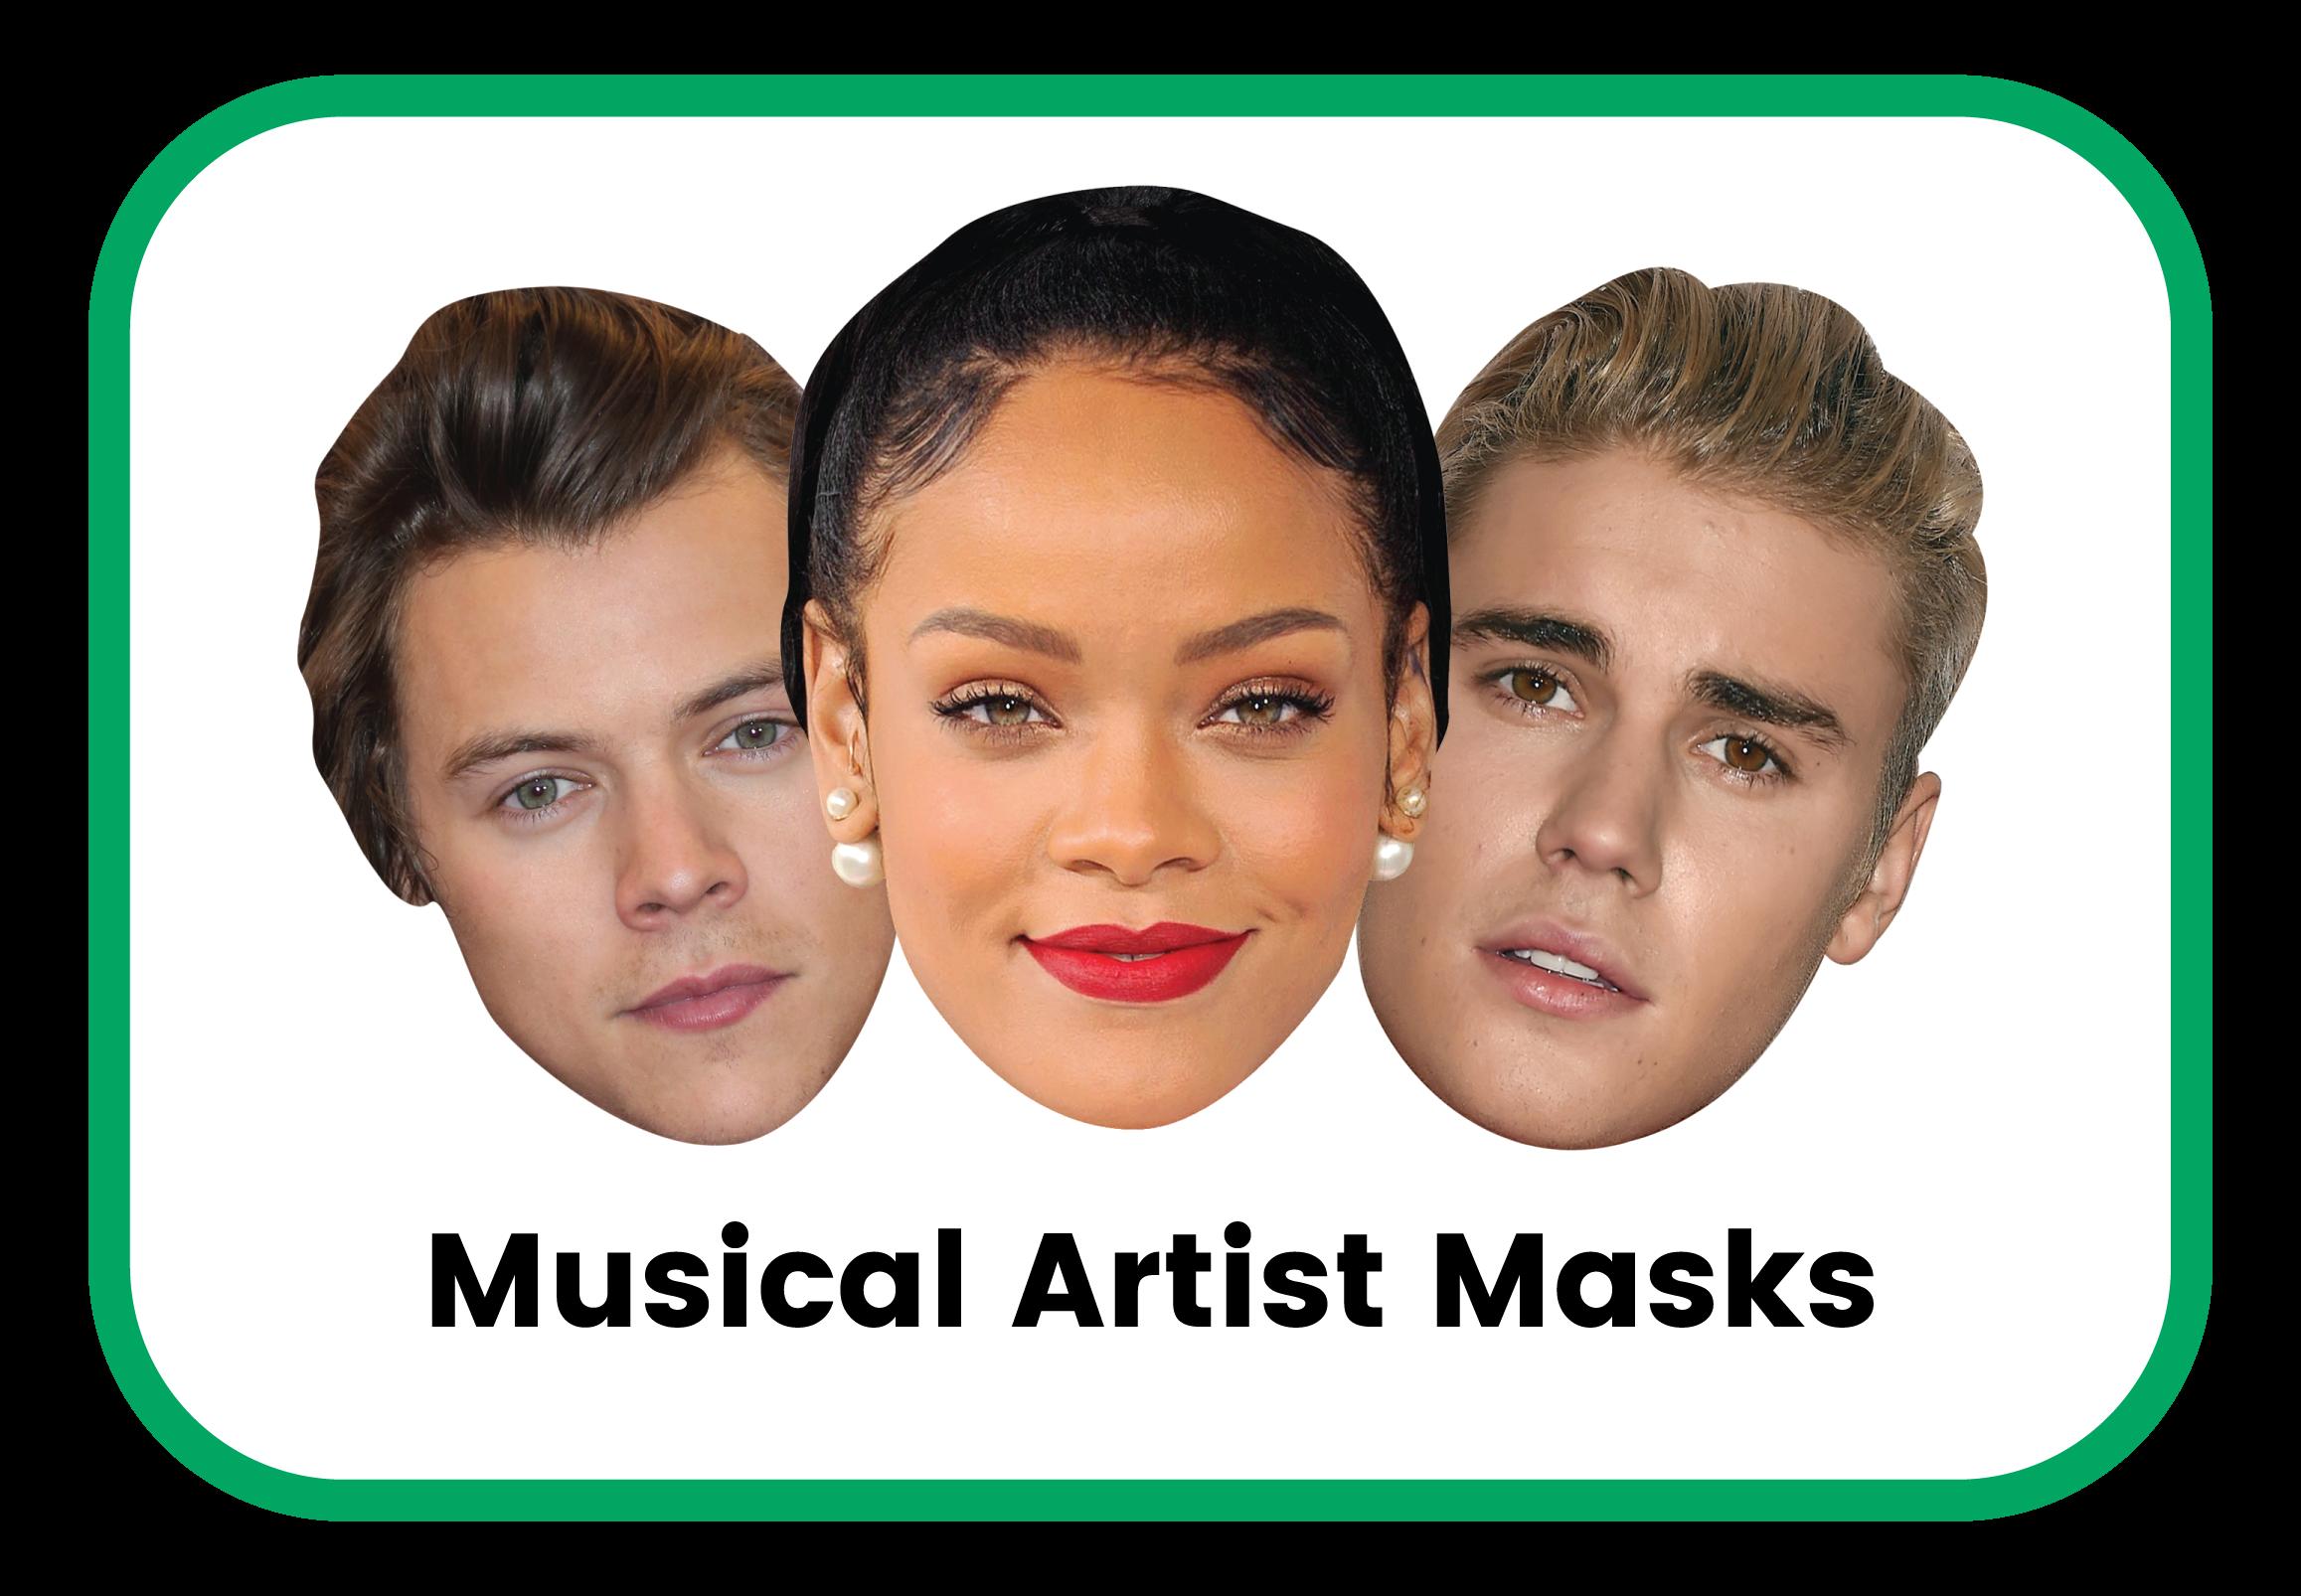 Musical artist cardboard masks